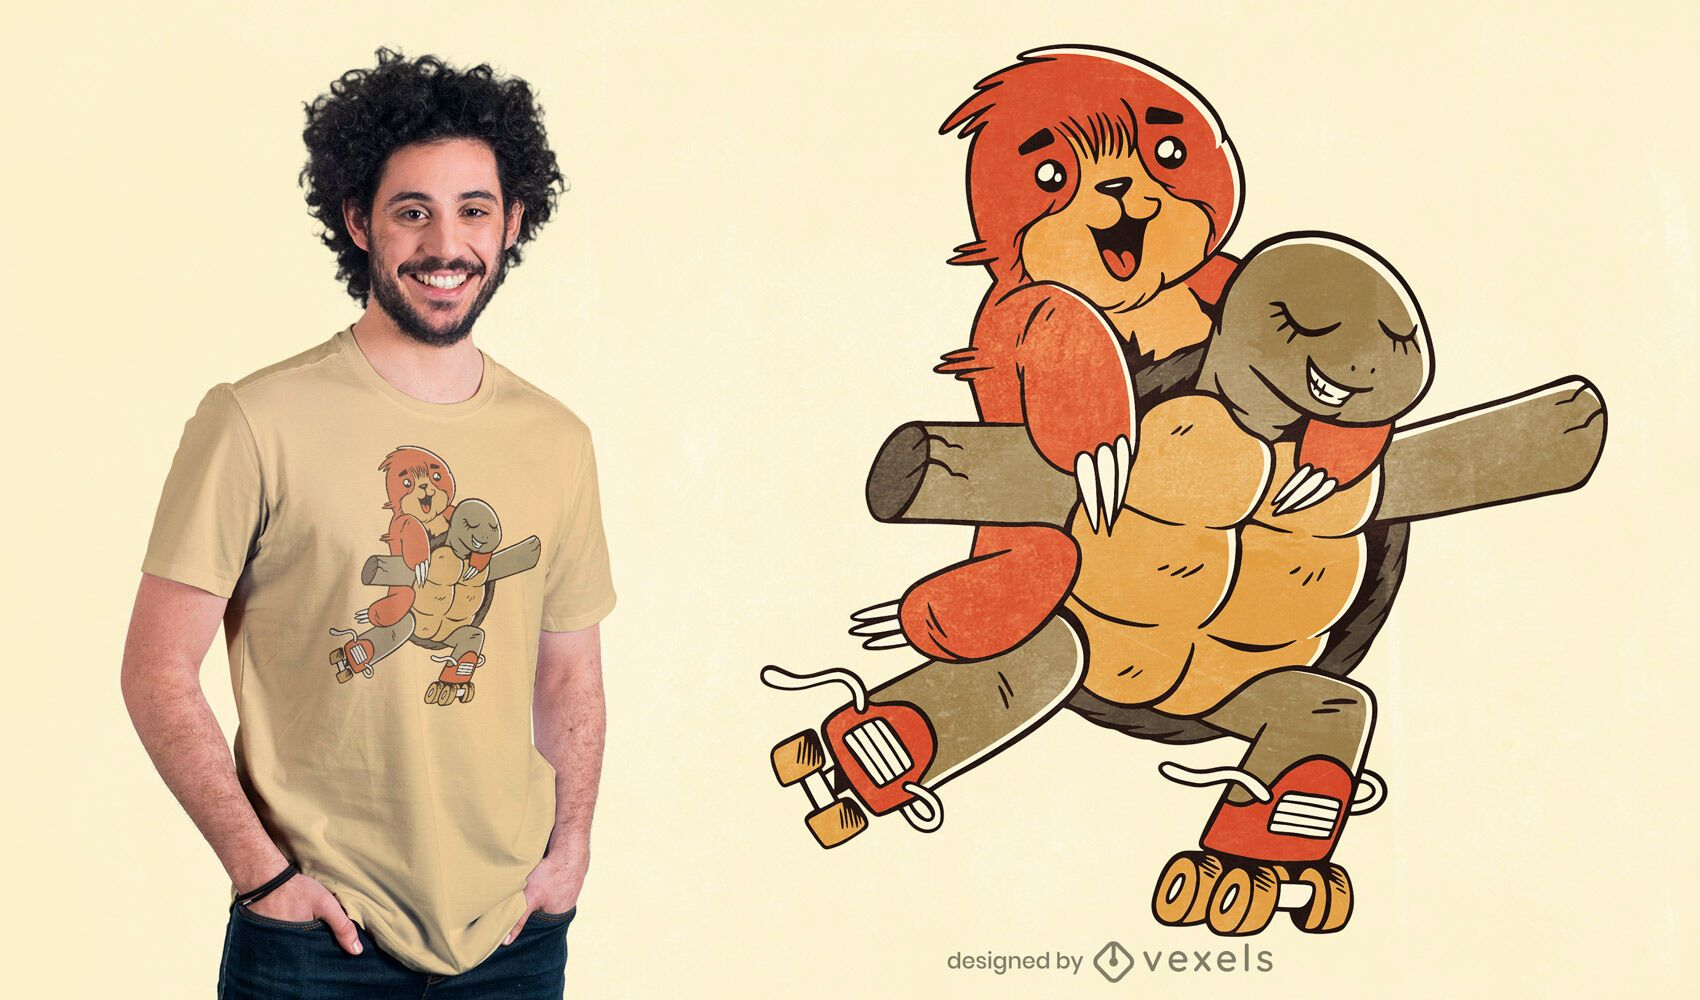 Sloth and turtle roller skating t-shirt design